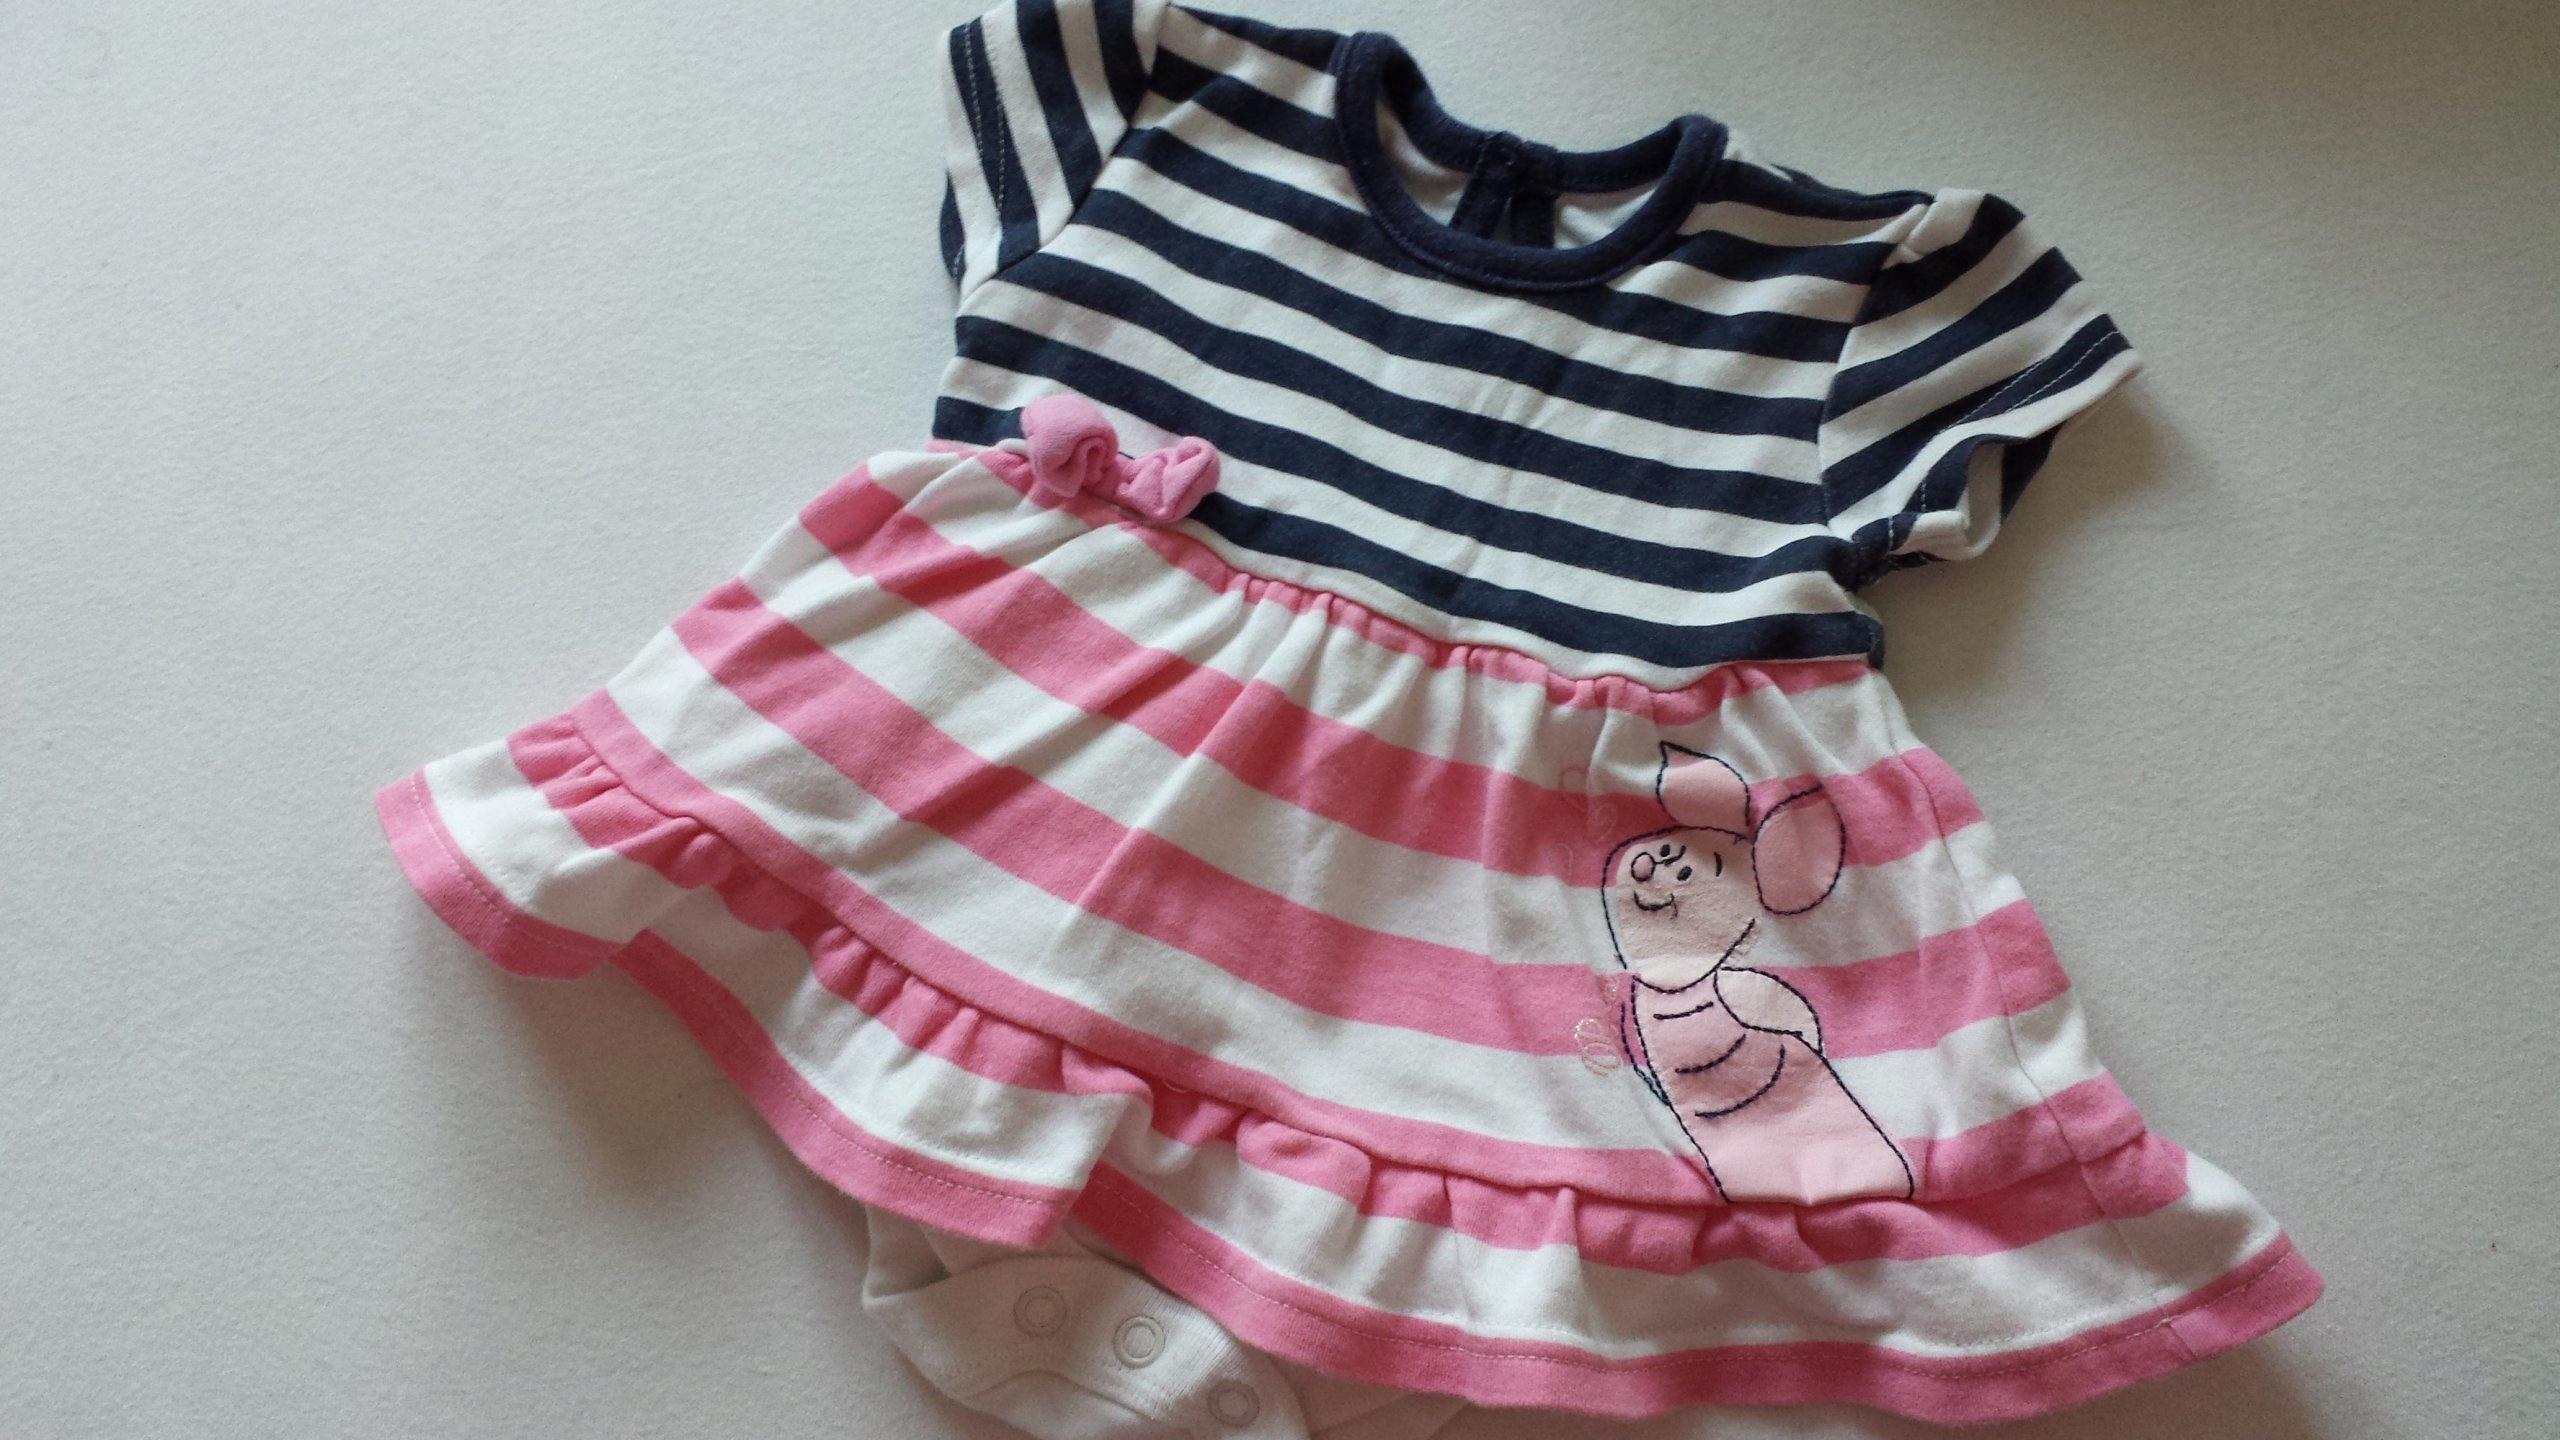 80cd2f7385ace2 CUDO body - sukienka George LATO first size 56 - 7421054480 ...